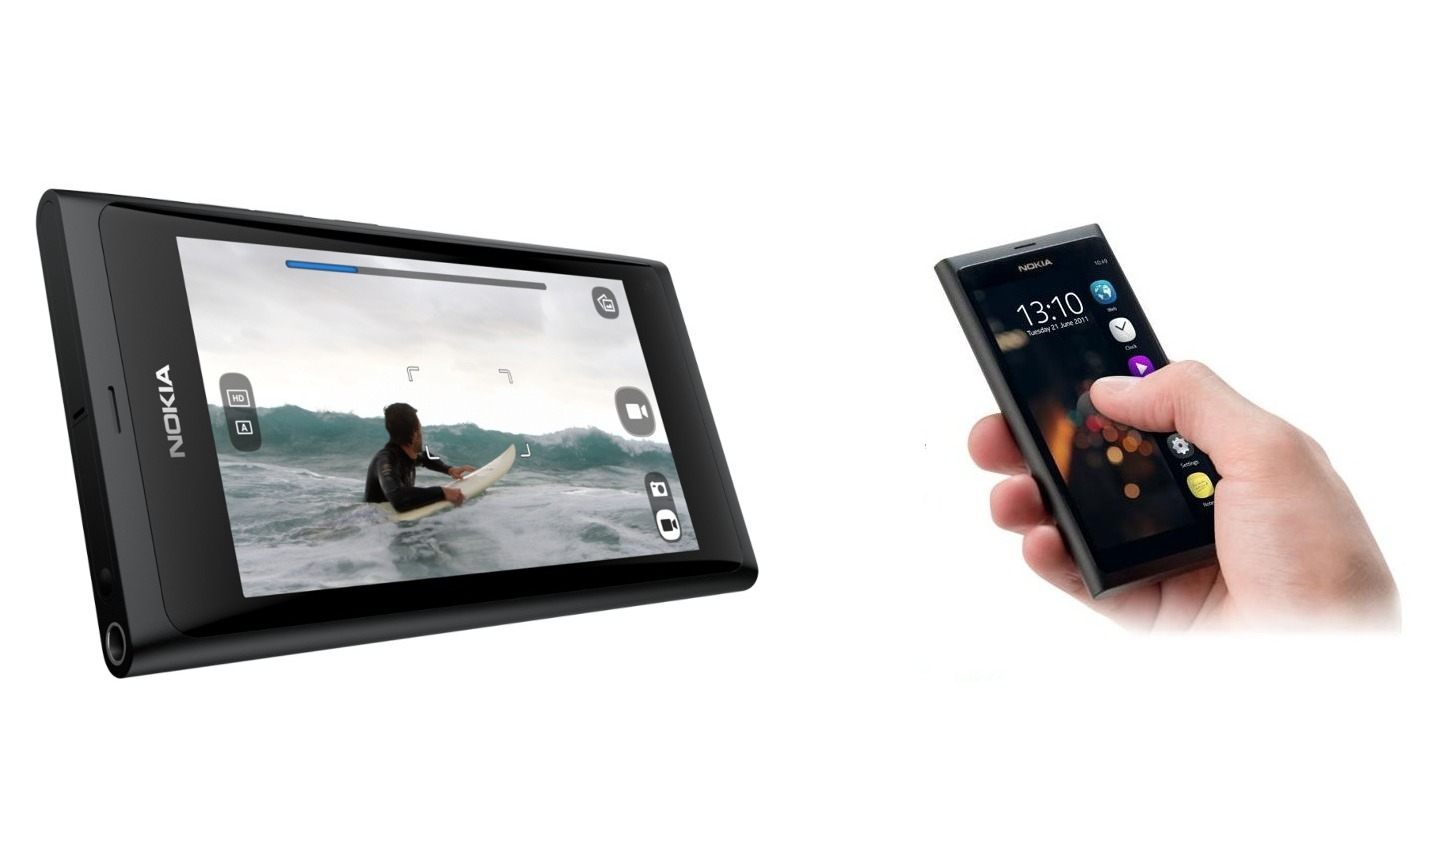 news: Nokia N9 - Just Swipe your Phone !